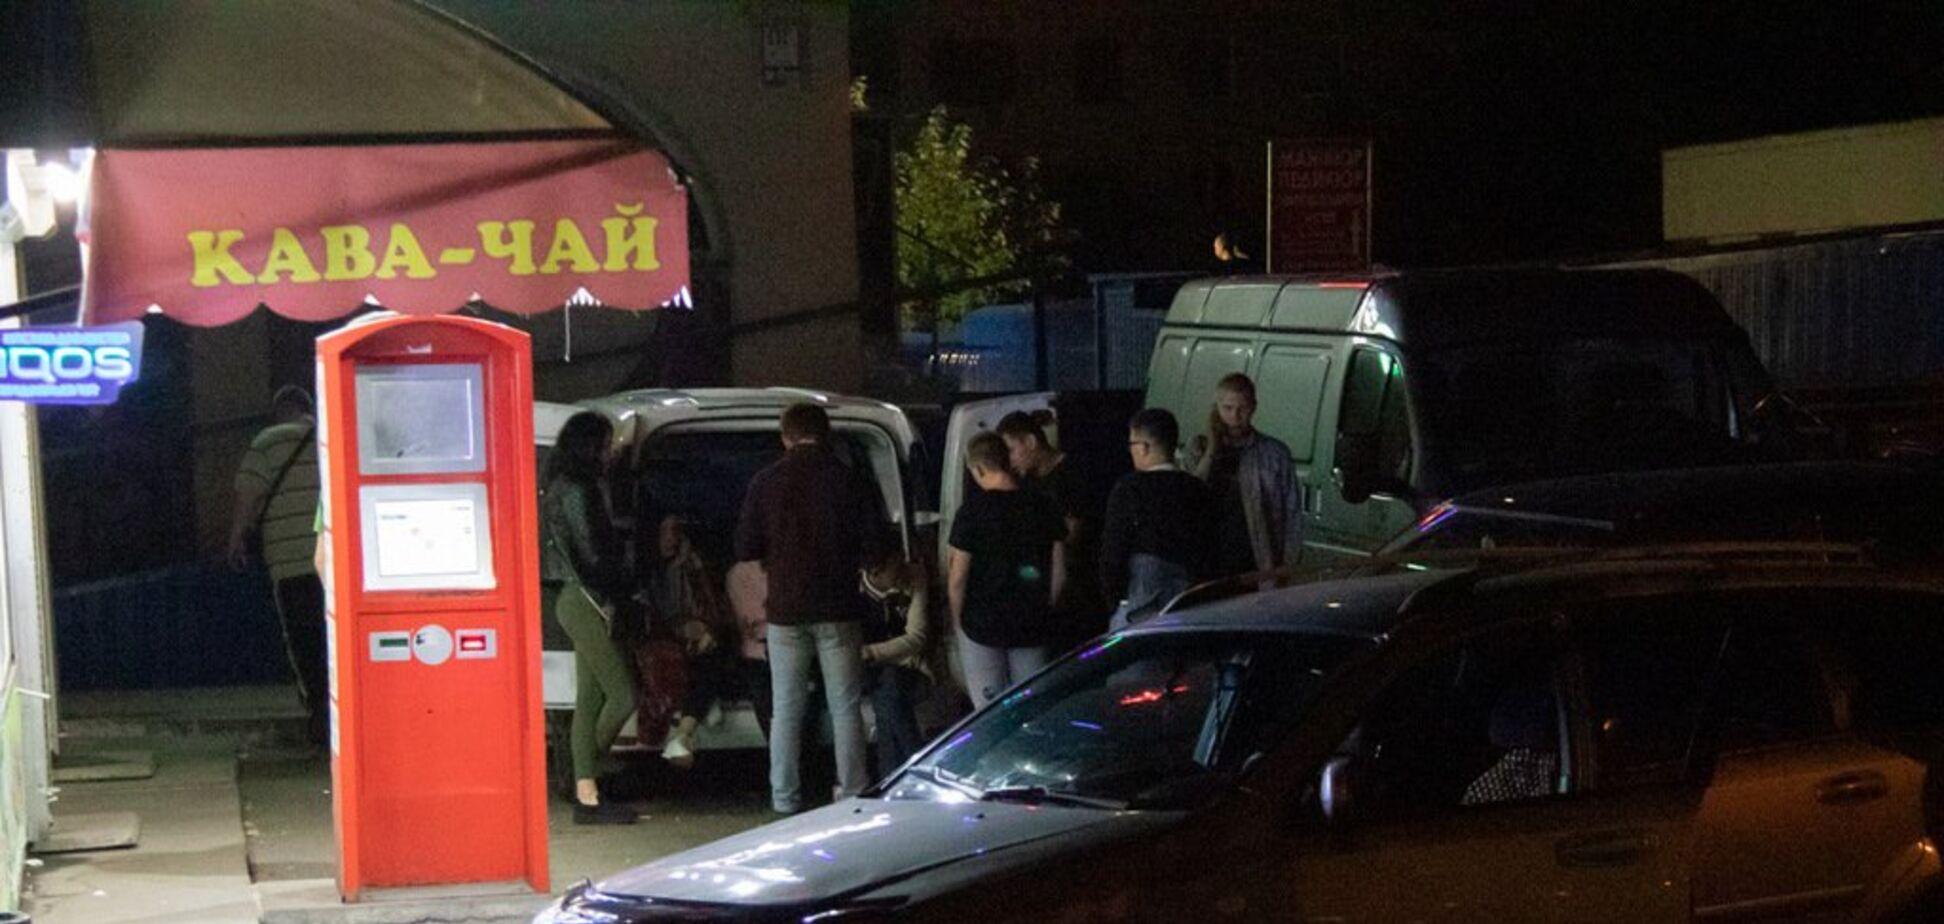 В Киеве возле кафе произошла драка со стрельбой: видео